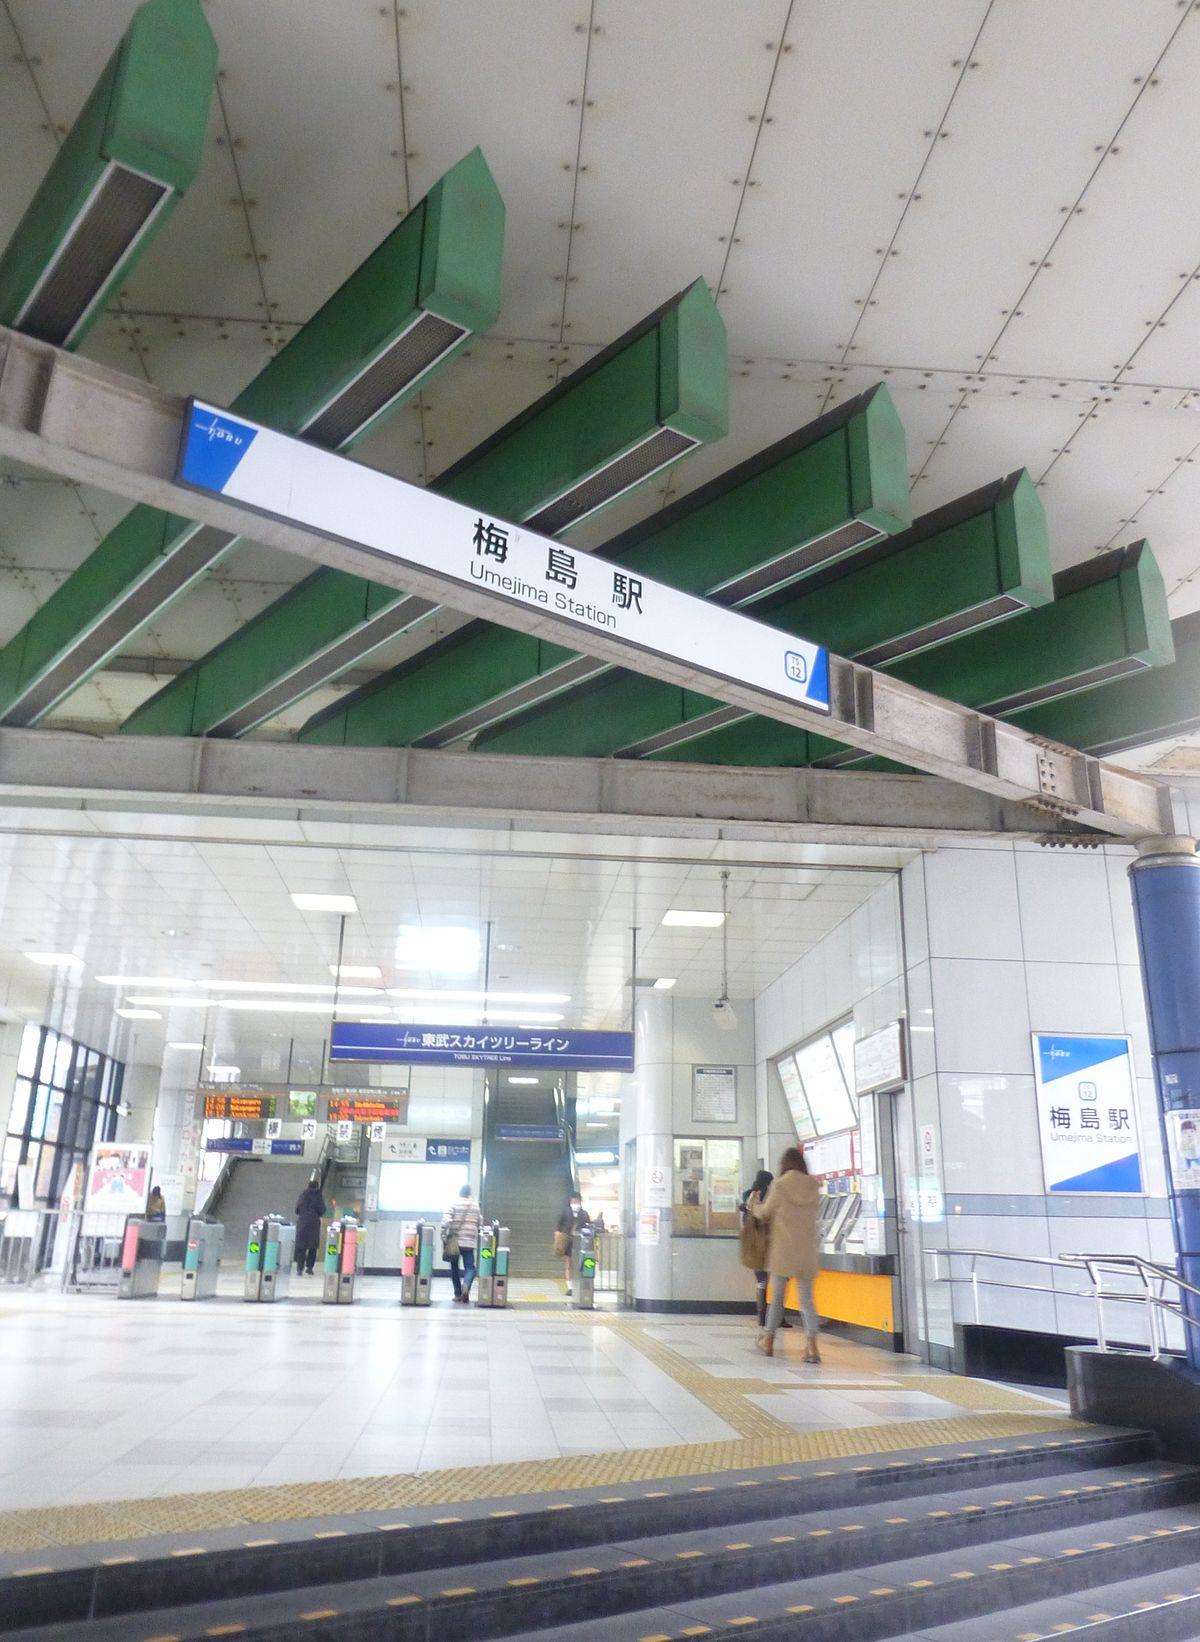 Umejimastation-exit-alt-march7-2014.jpg